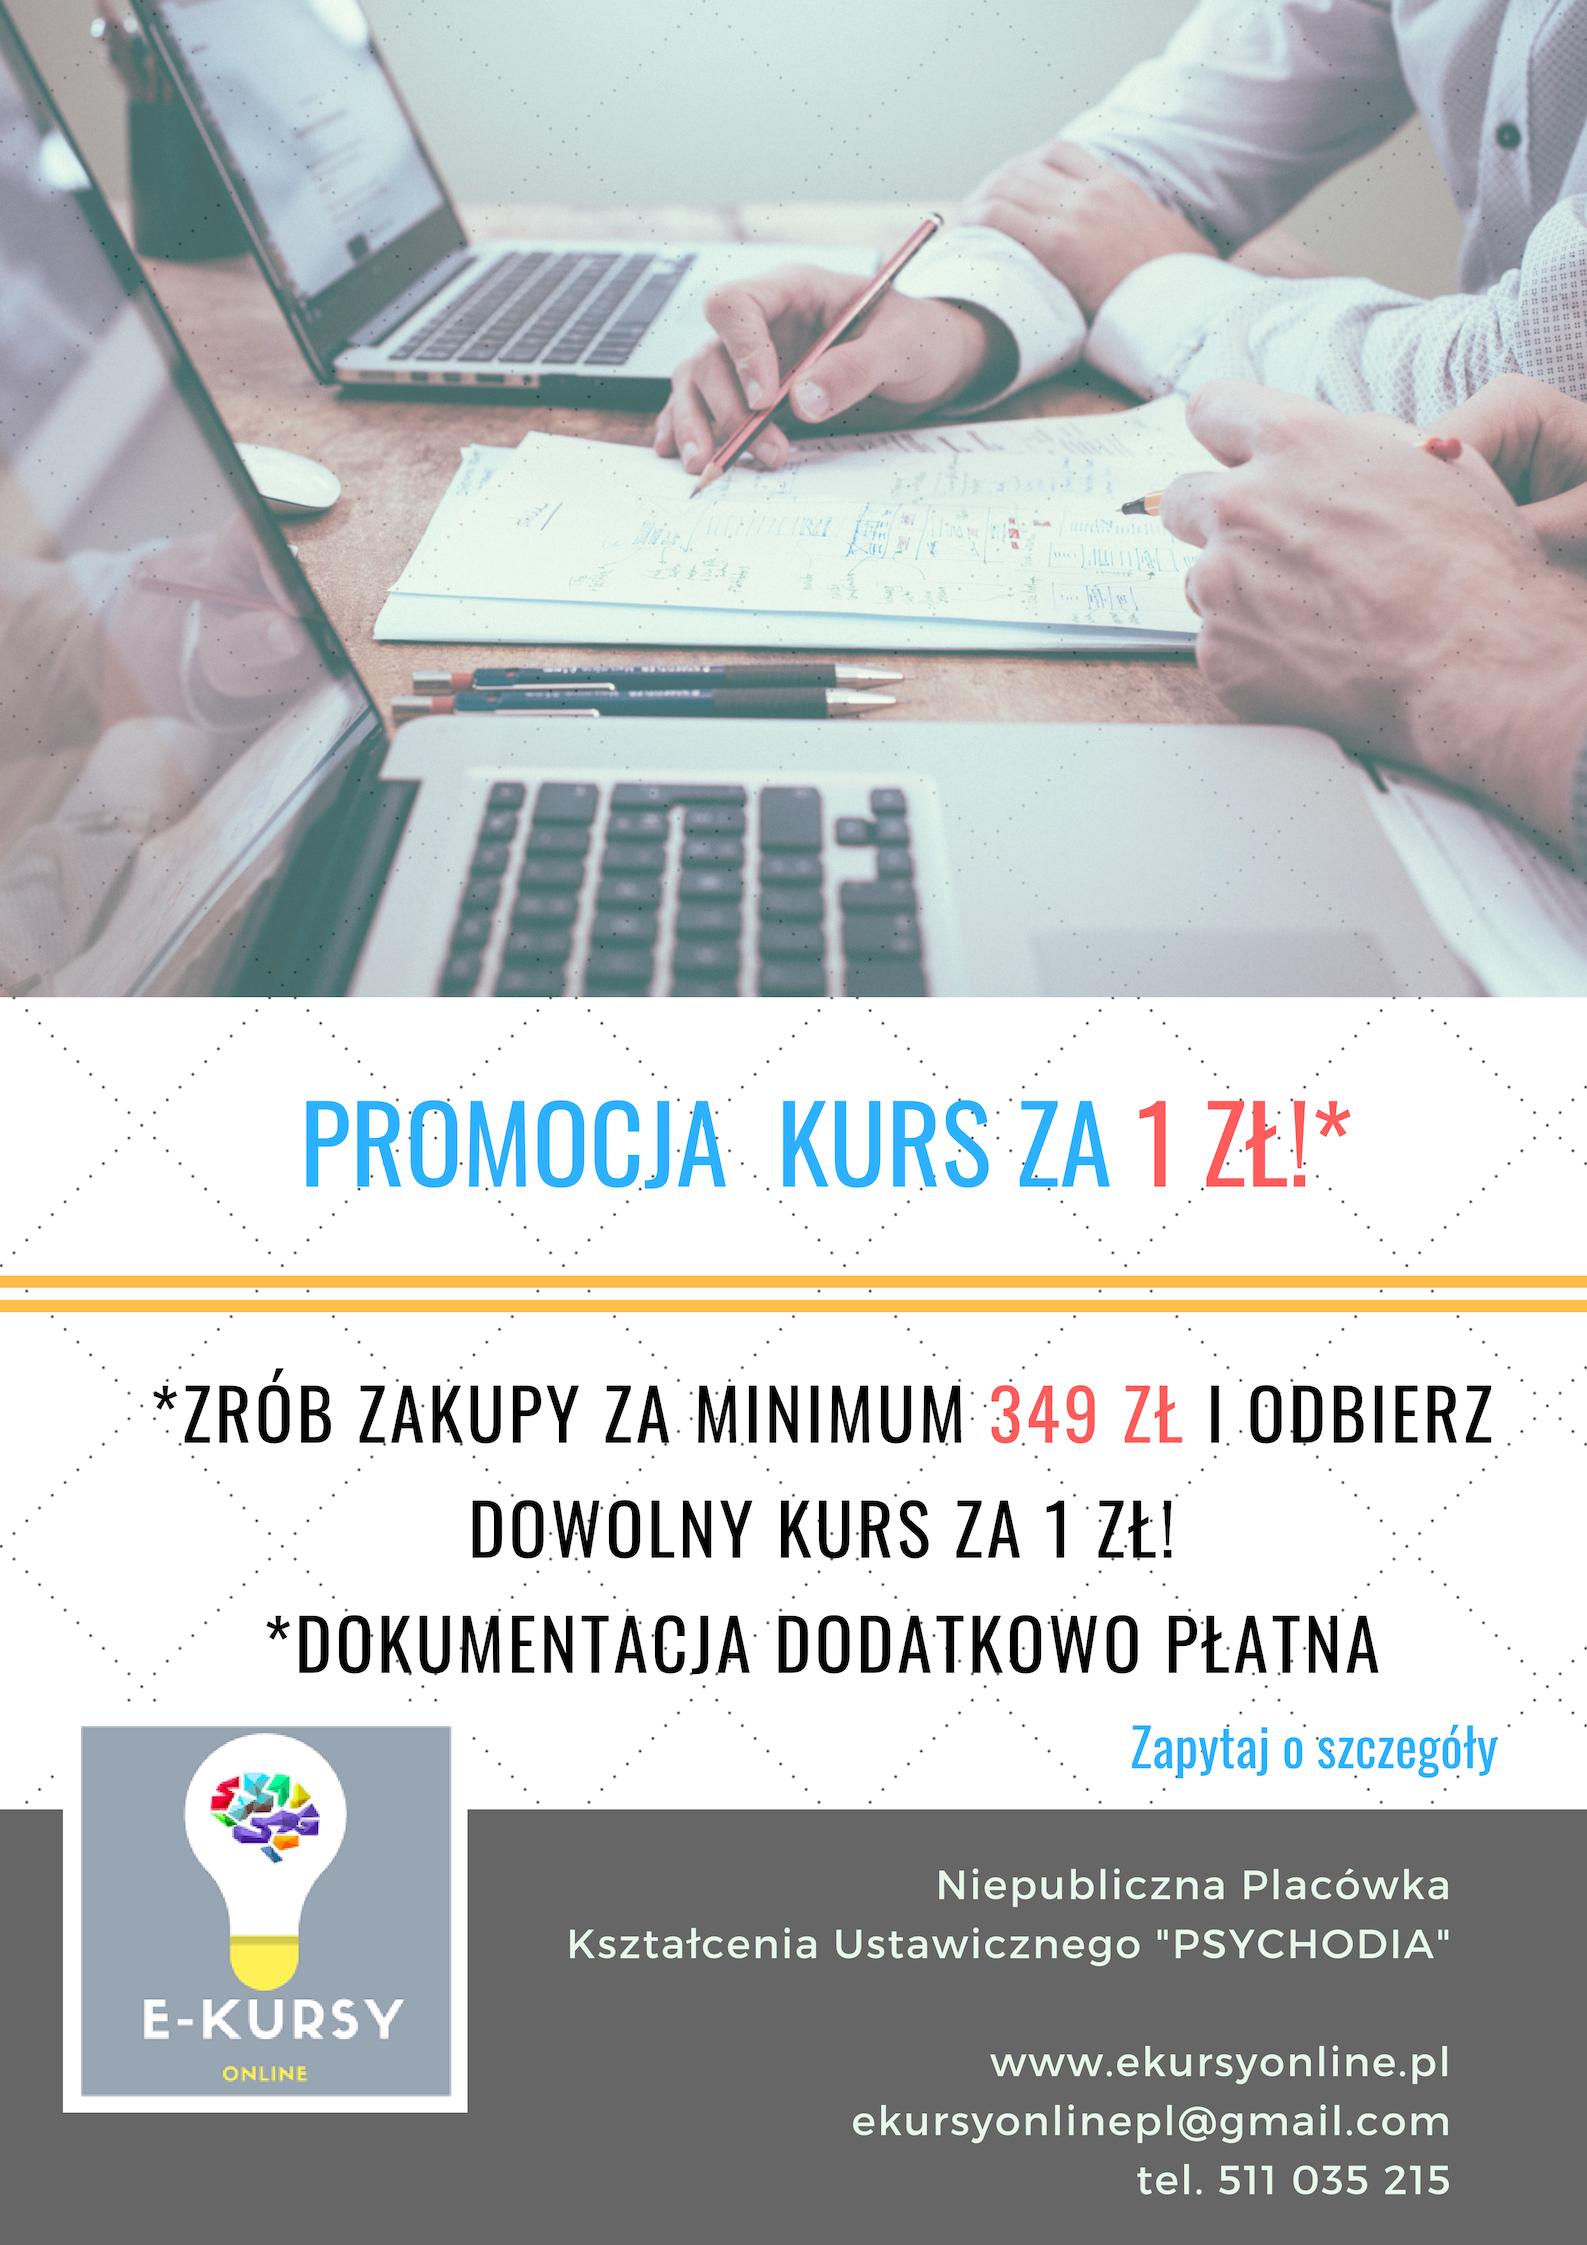 Promocja Kurs za 1 zł